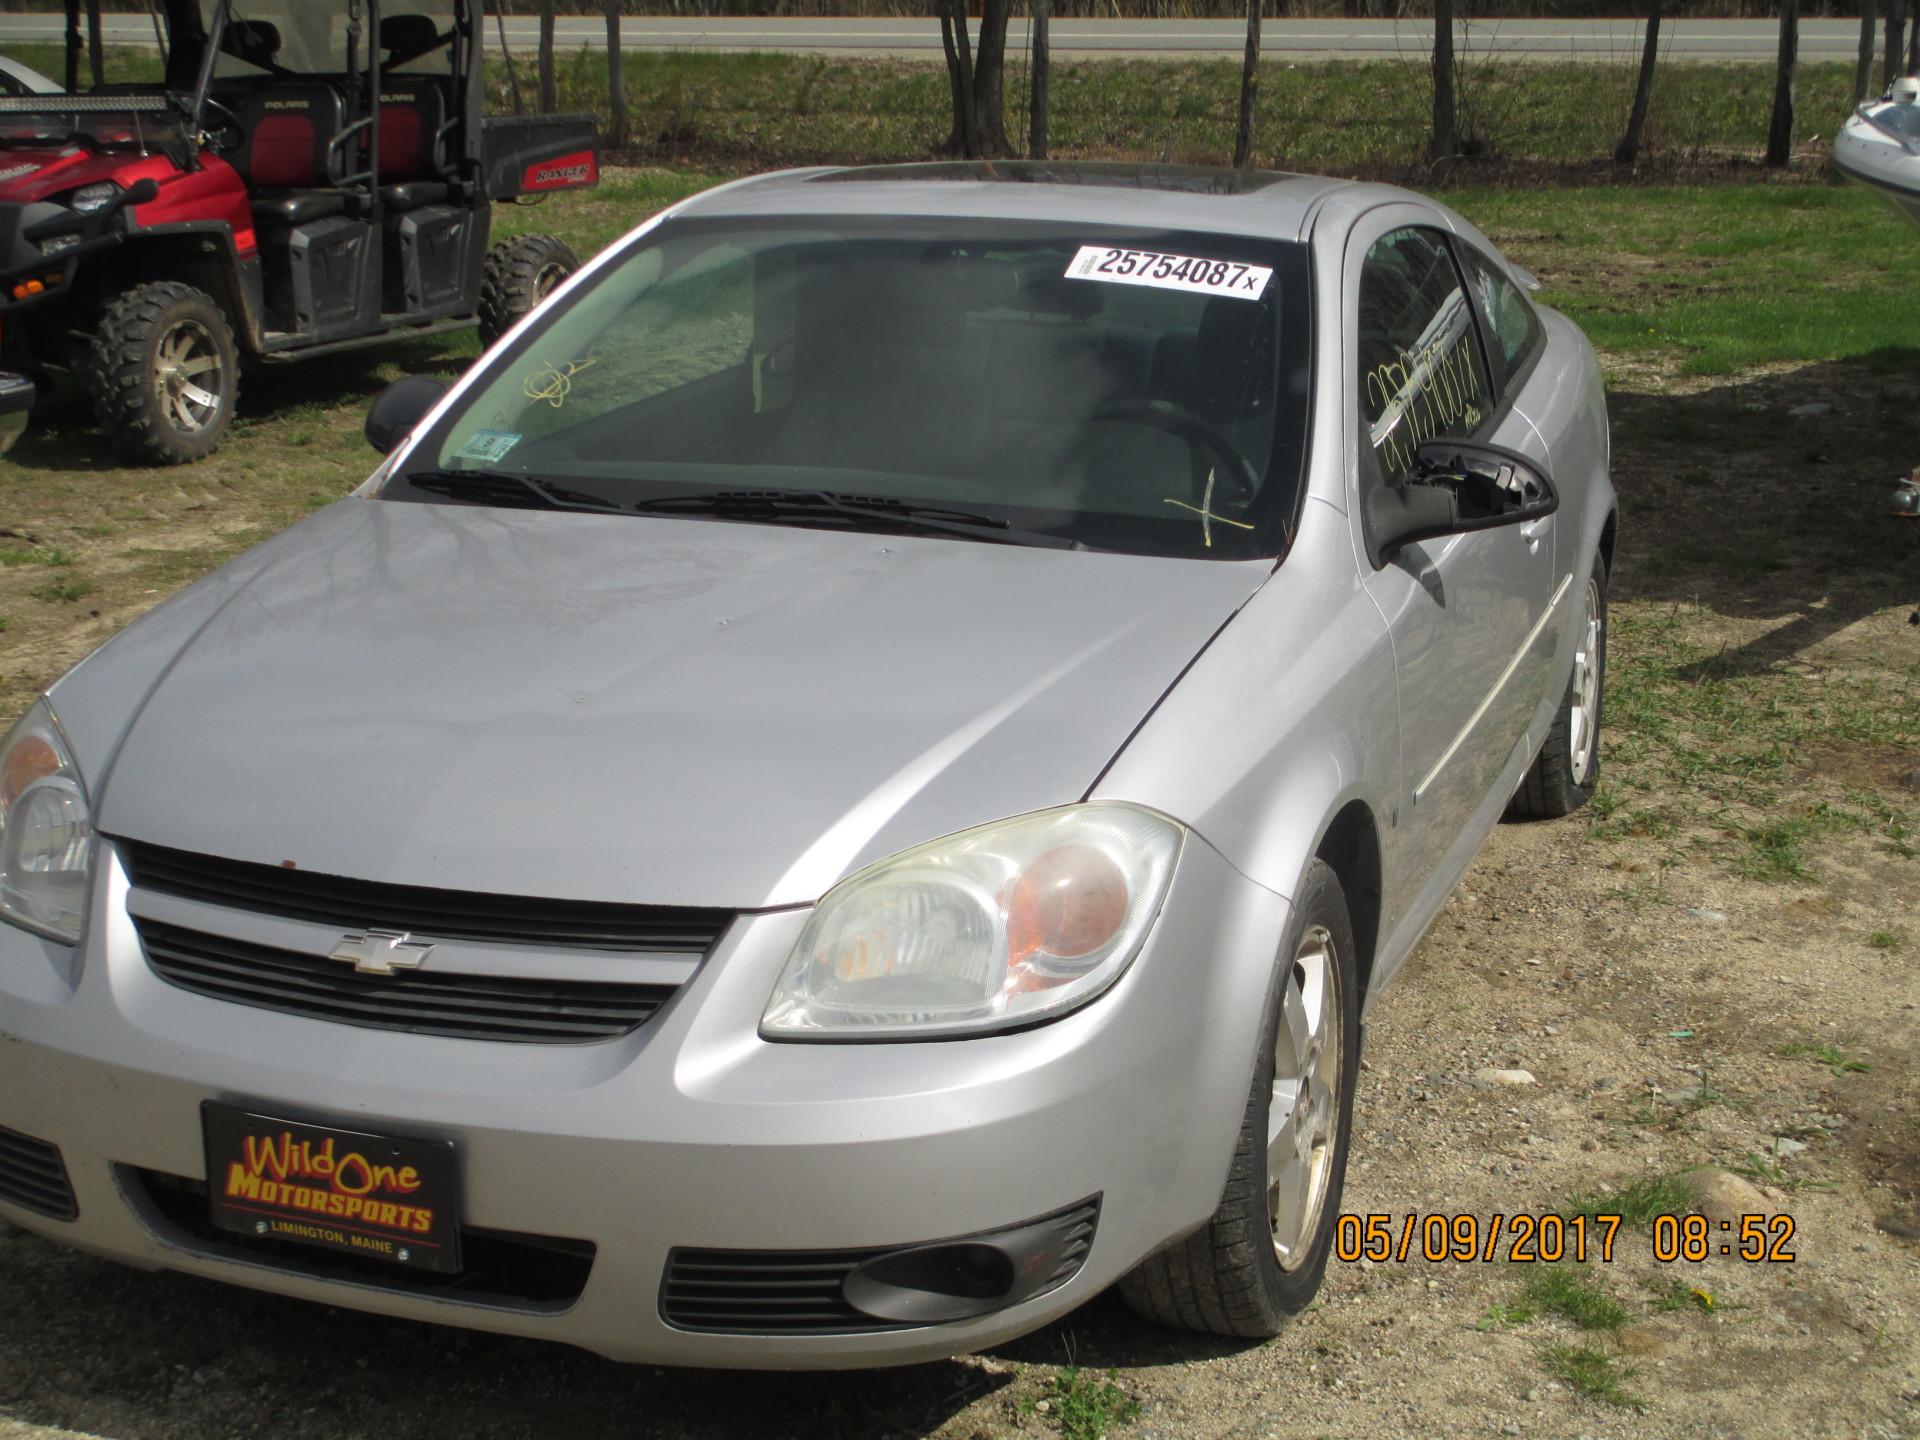 2006 Chevy Cobalt - Silver